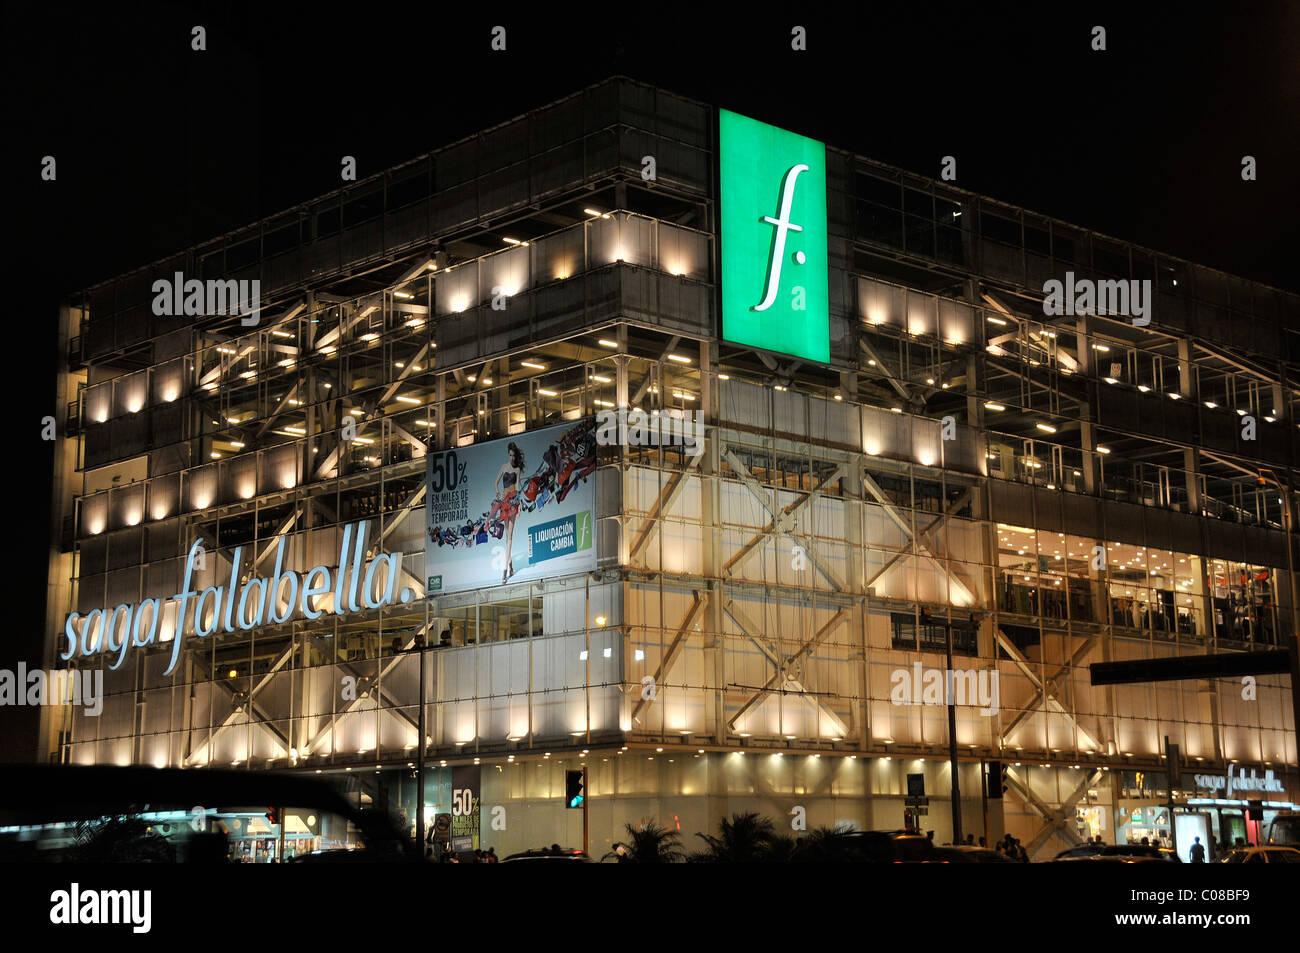 Saga Falabella Mall by night, Miraflores, Lima, Peru - Stock Image